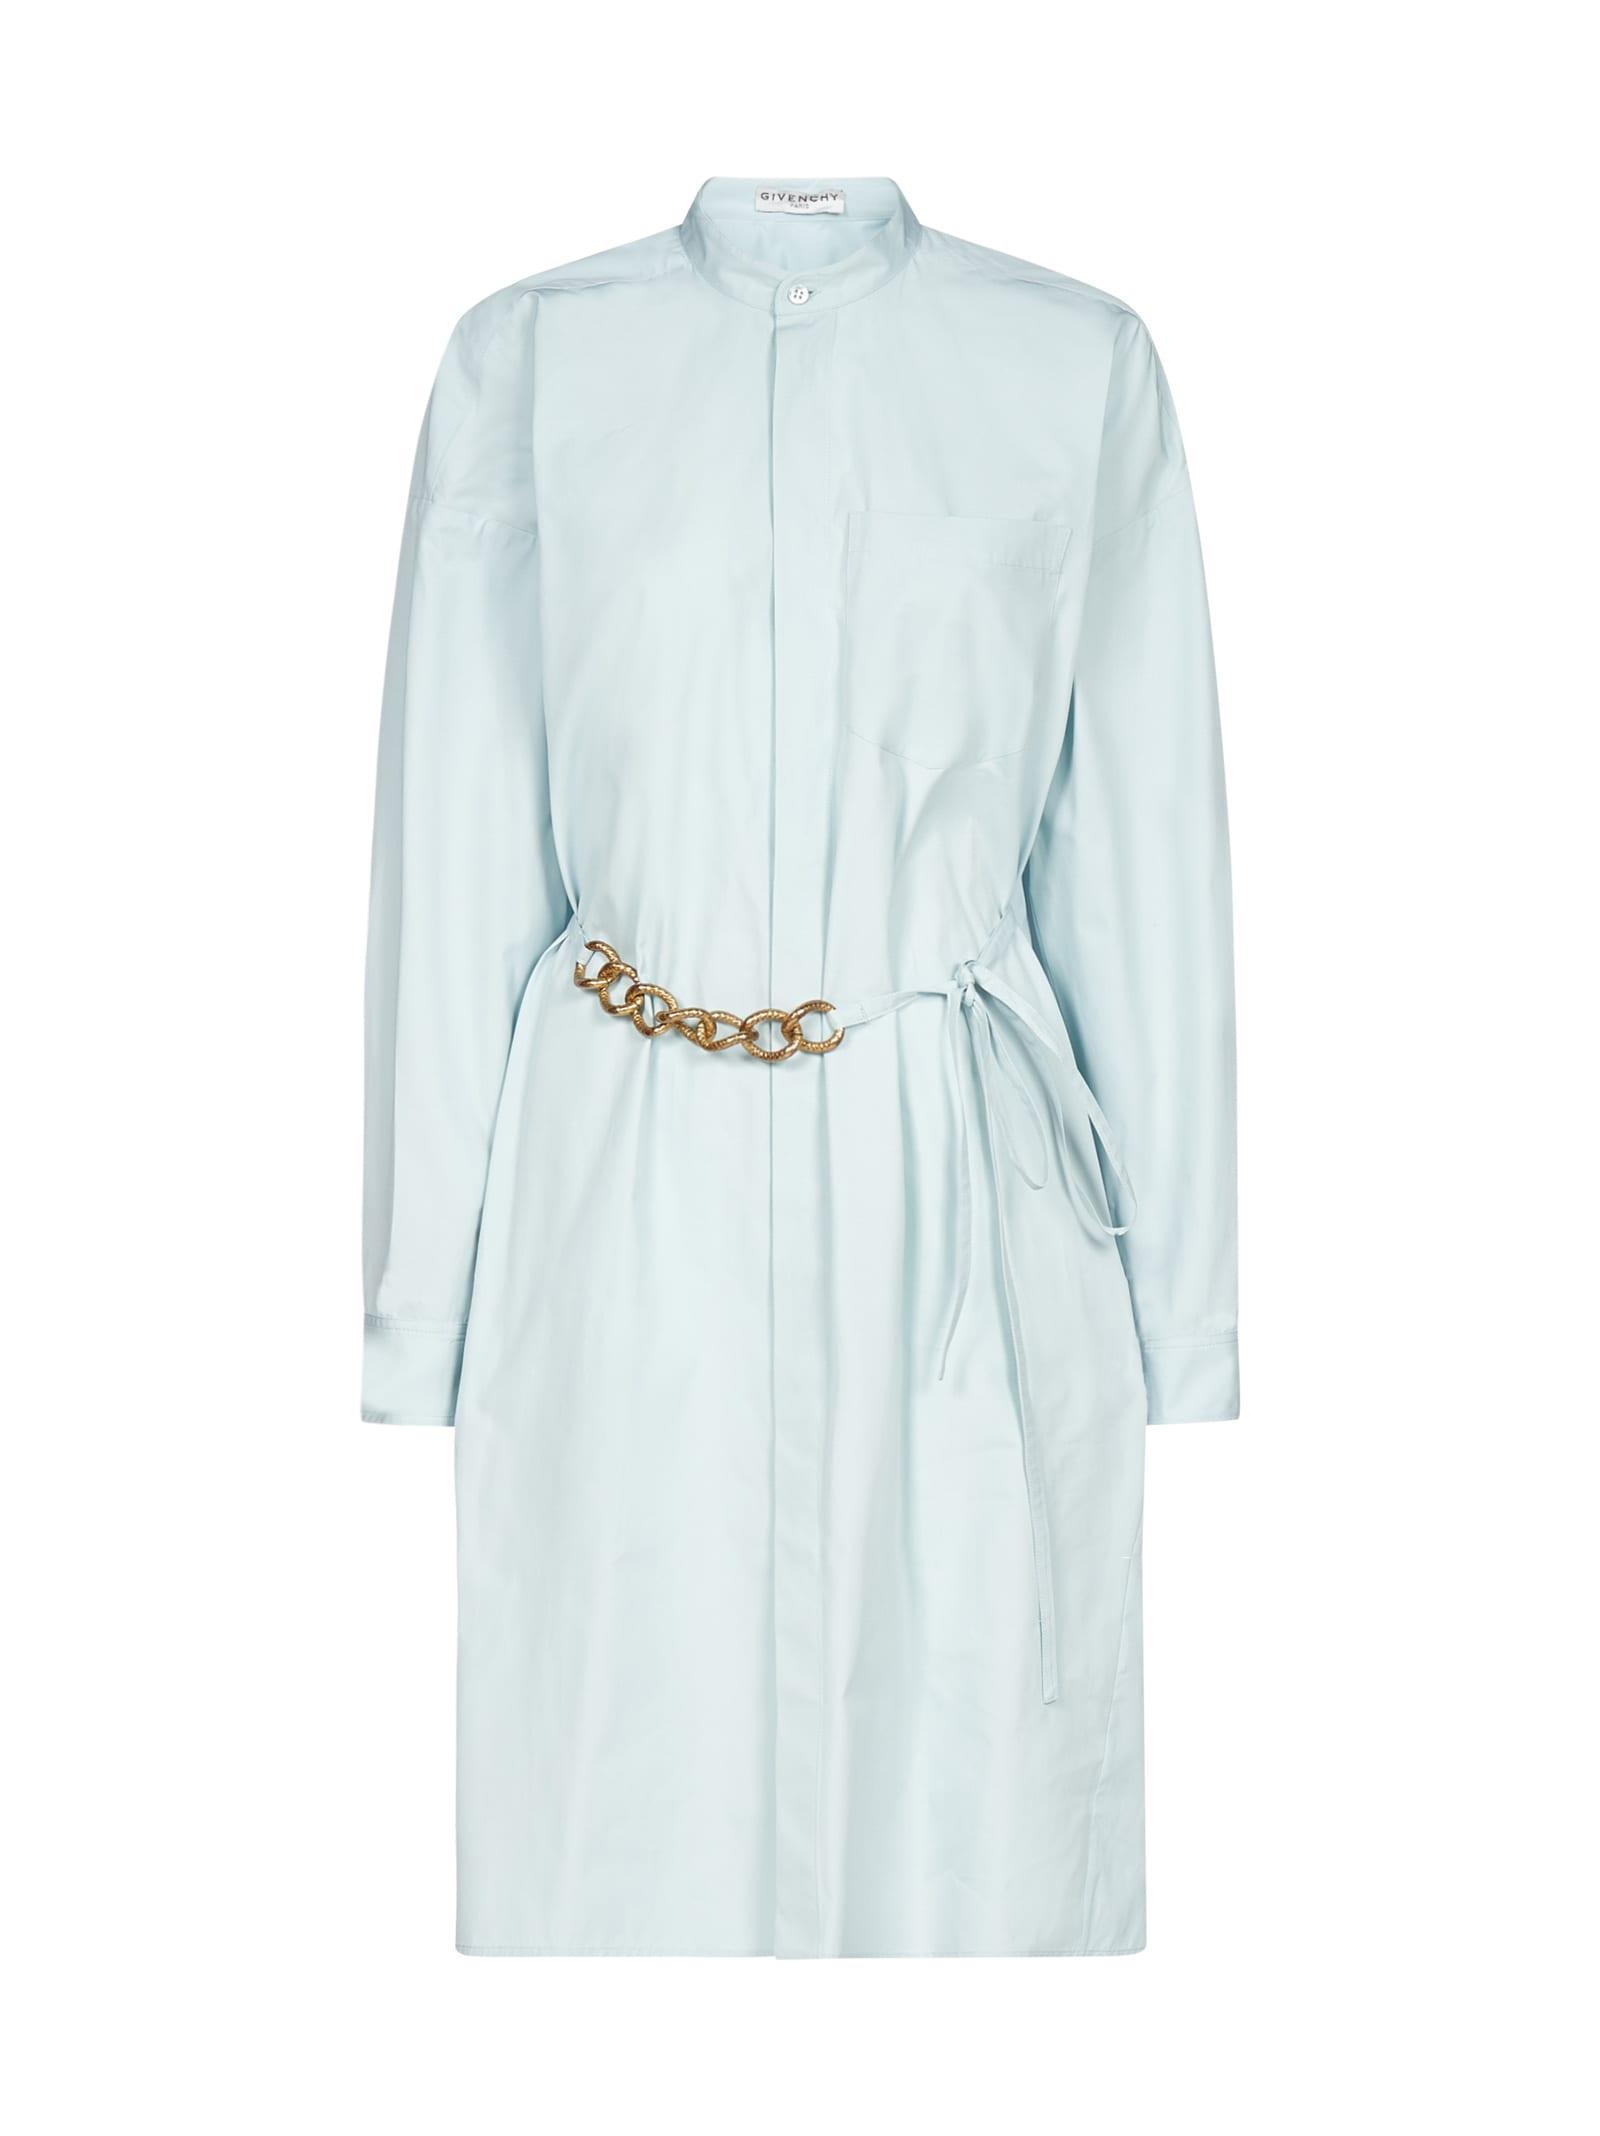 Givenchy Jewel-belt Cotton Shirt Dress